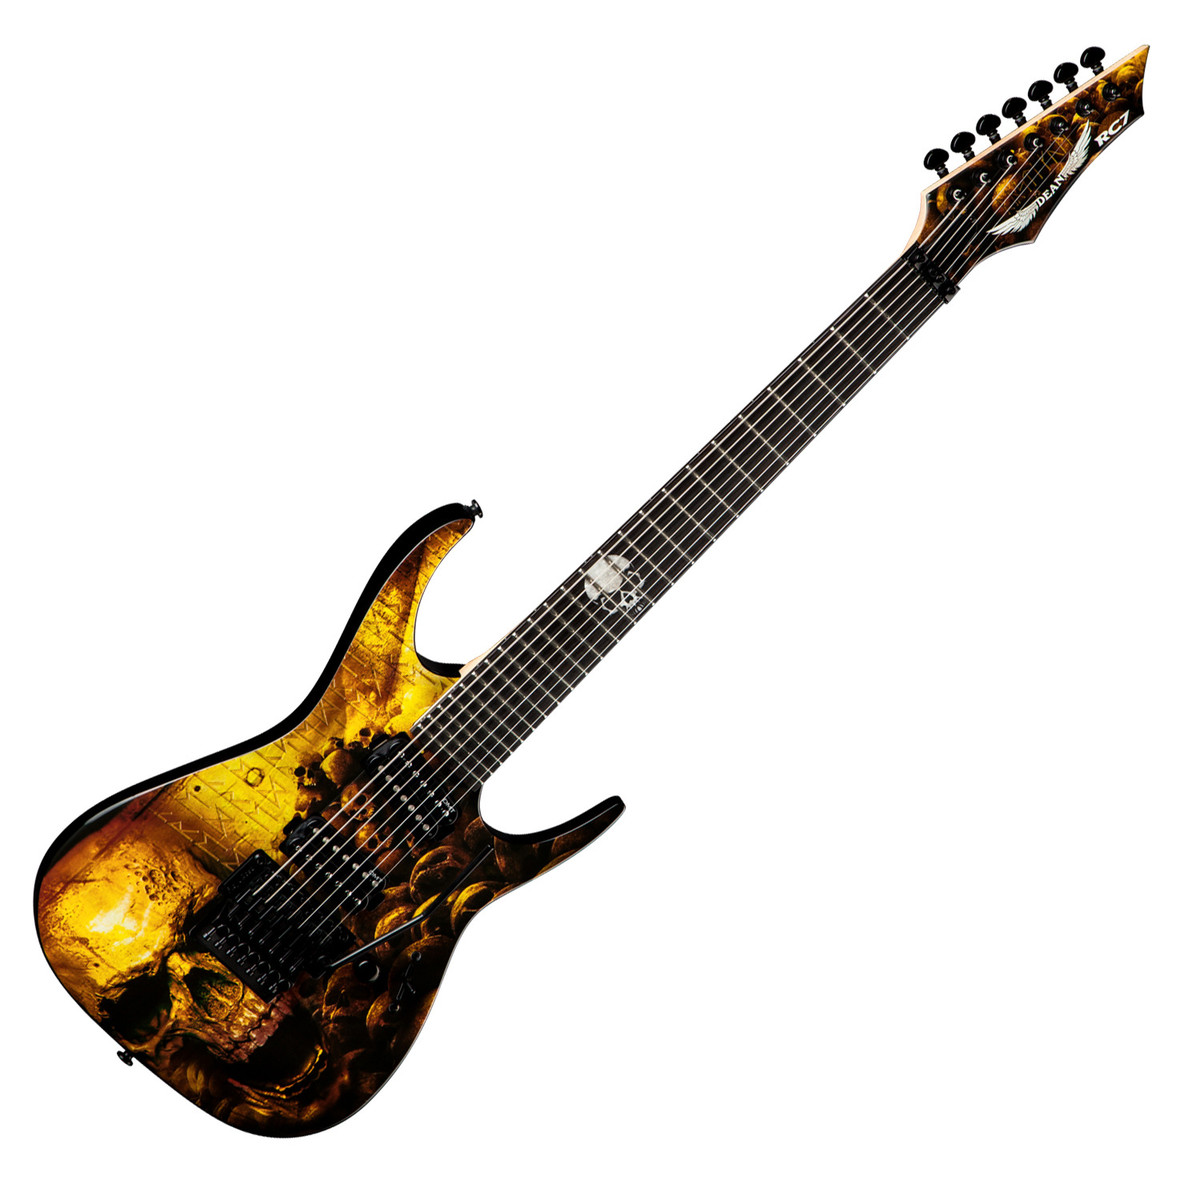 disc dean rusty cooley 7 string electric guitar skulls at gear4music. Black Bedroom Furniture Sets. Home Design Ideas